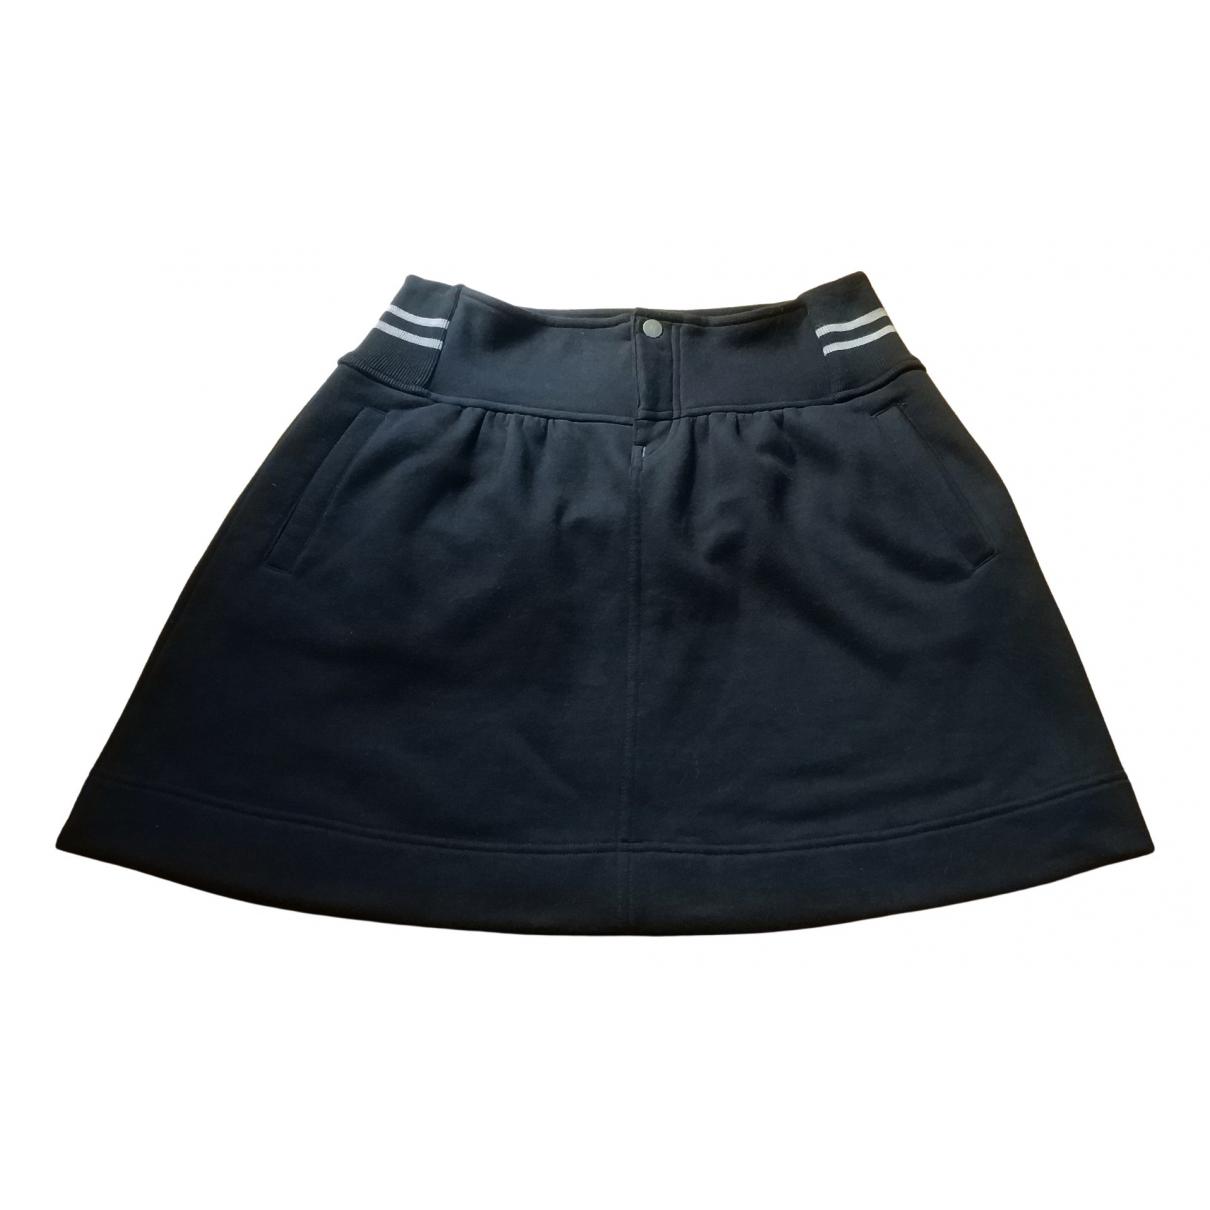 Emporio Armani \N Black Cotton - elasthane skirt for Women S International